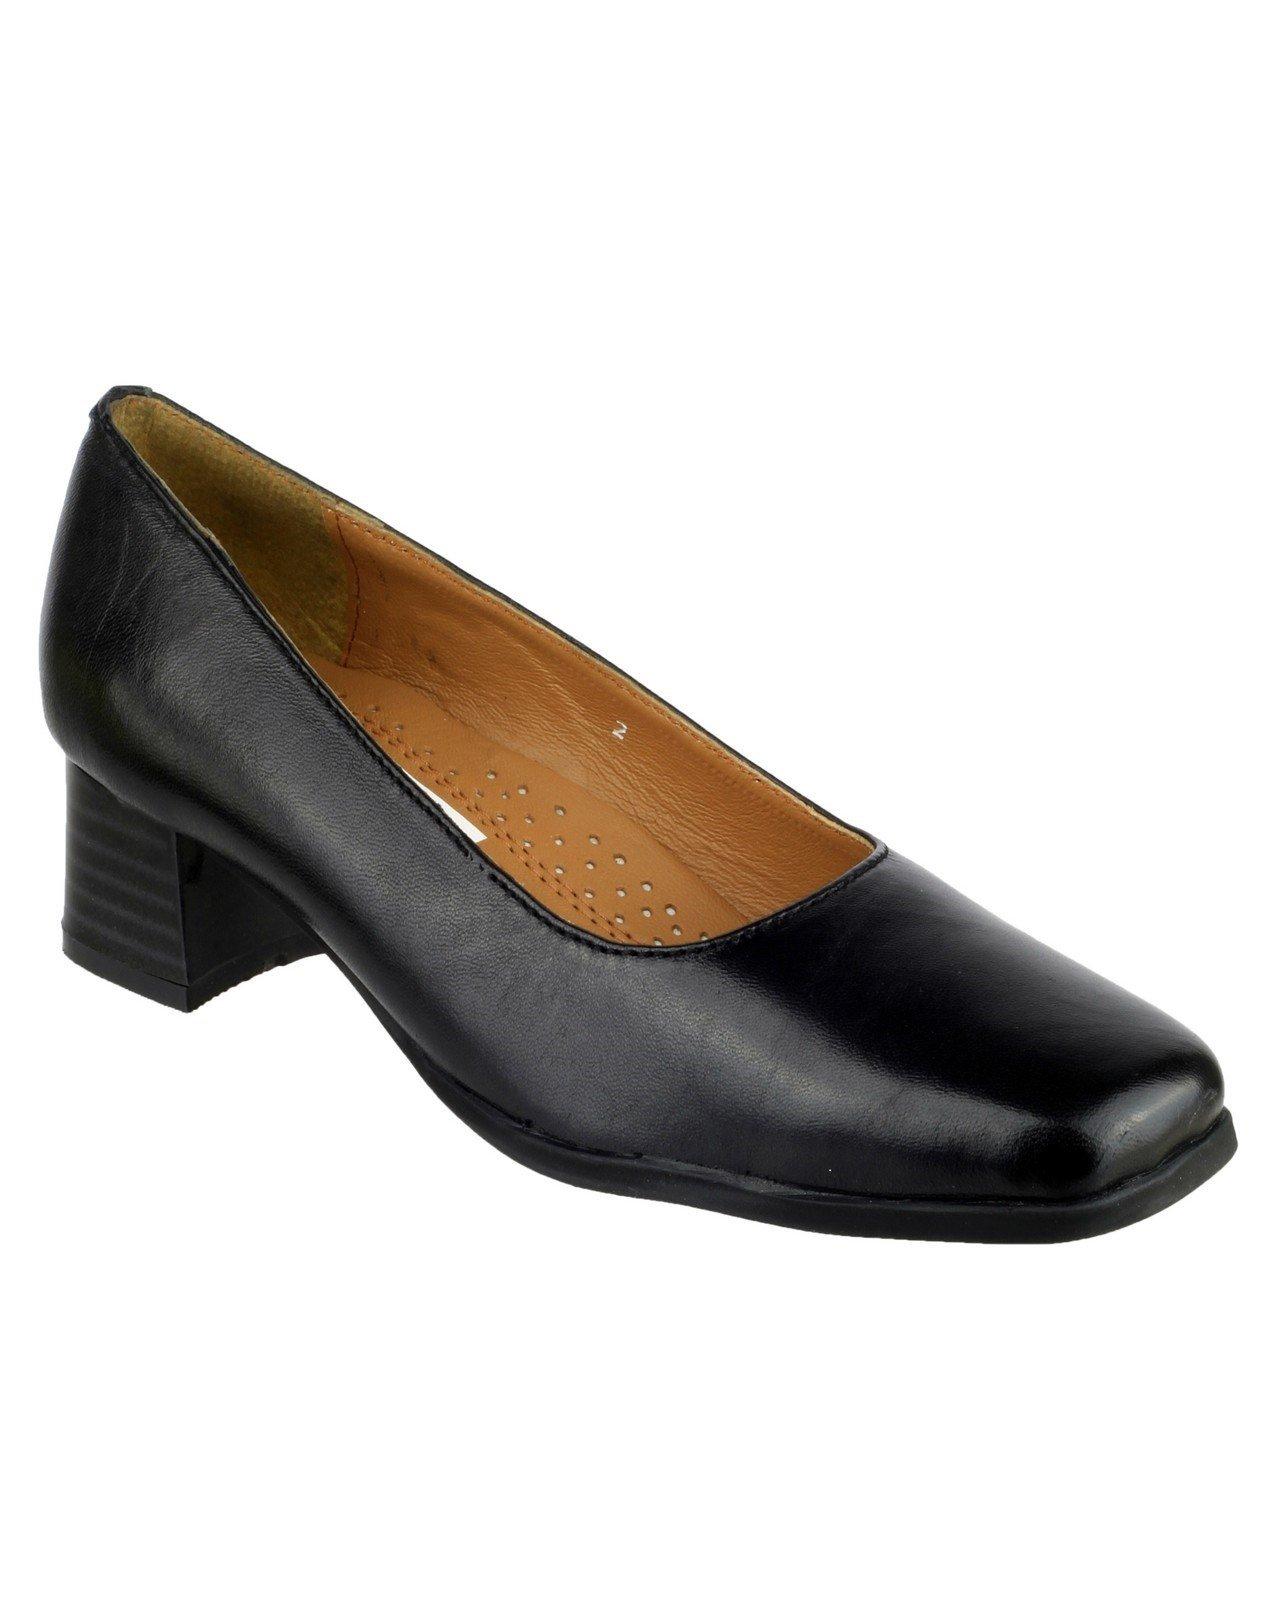 Amblers Women's Walford Ladies Leather Court Shoe Black 15234 - Black 3